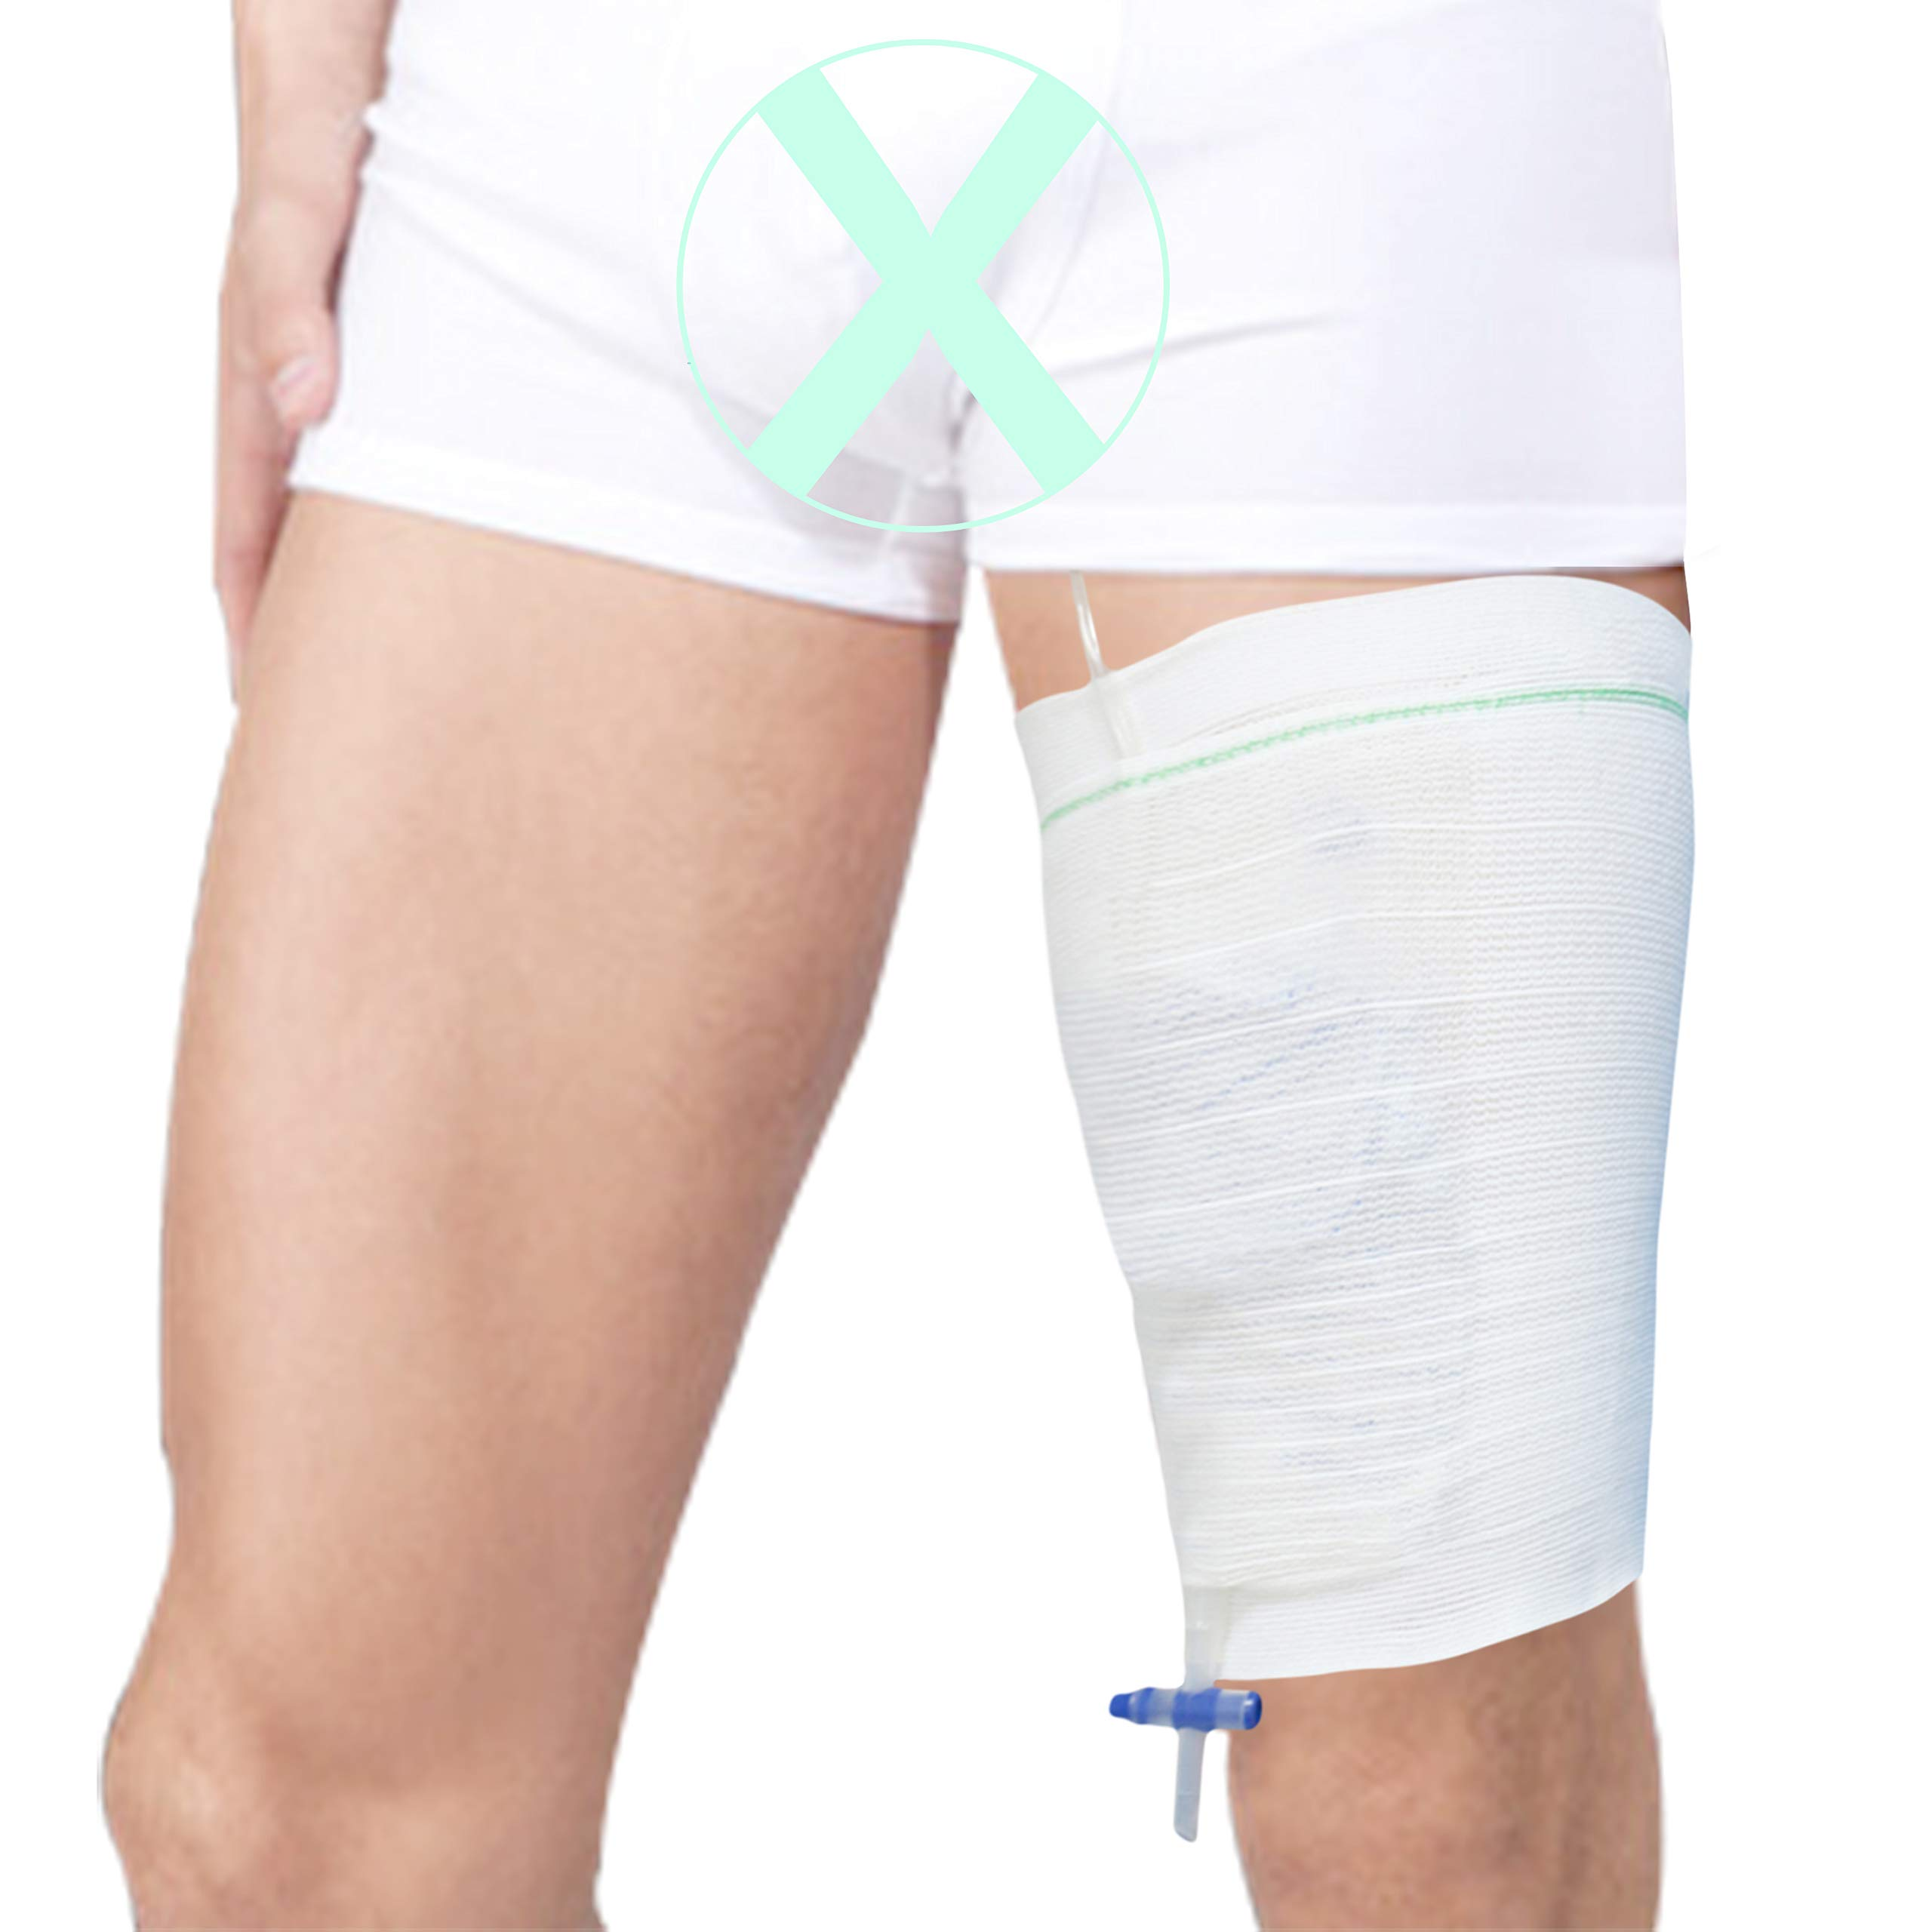 Urine Bag Holder Carer 2pcs Drainage Bag Covers Catheter Bag Leg Sleeve Urinary Incontinence Supplies Large